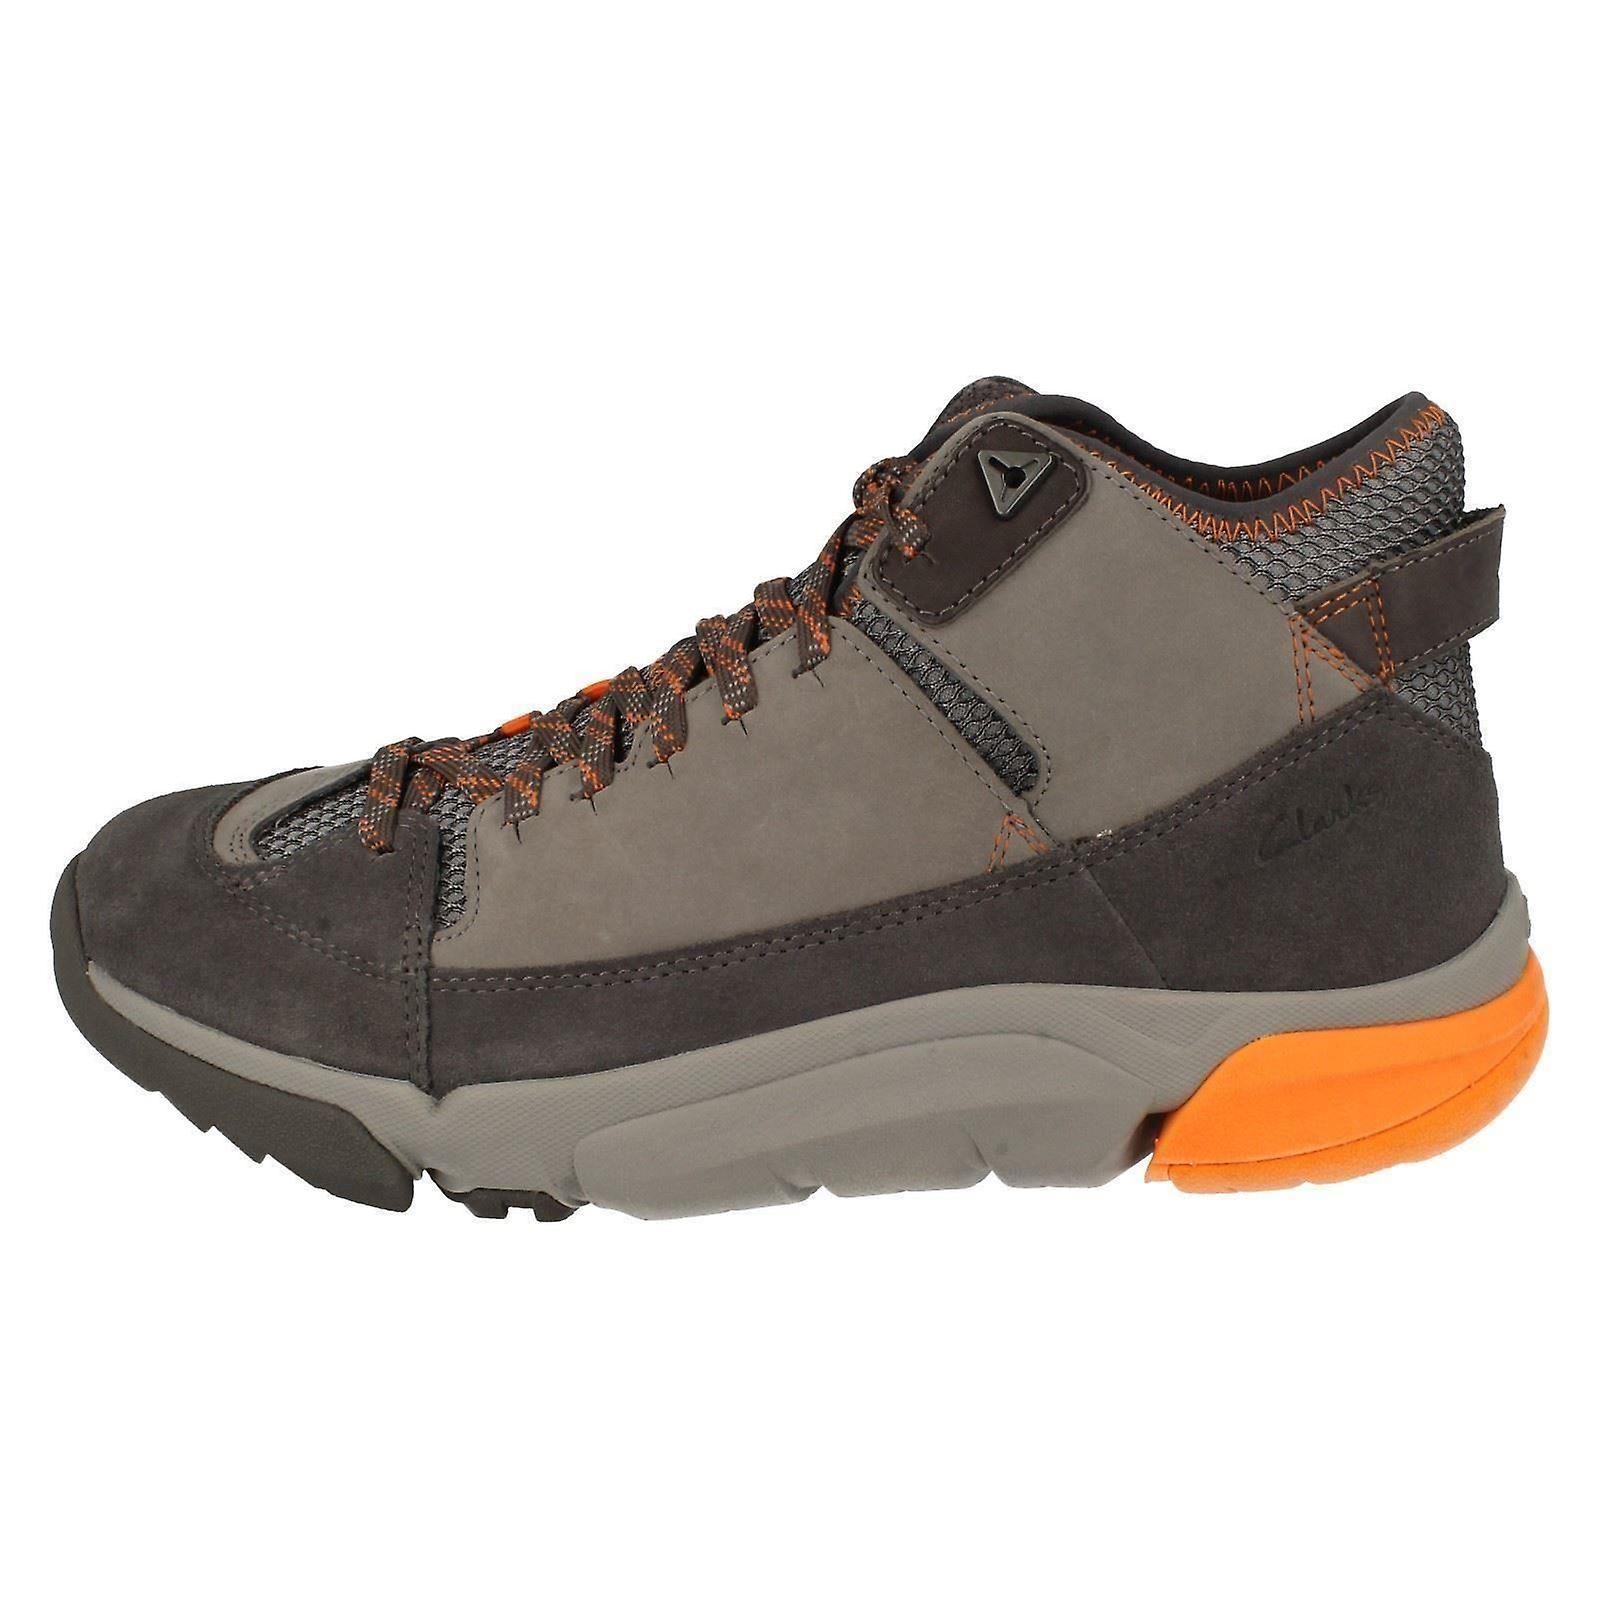 Tri Mens Clarks Outflex Outdoor Boots tq8dwxSr8